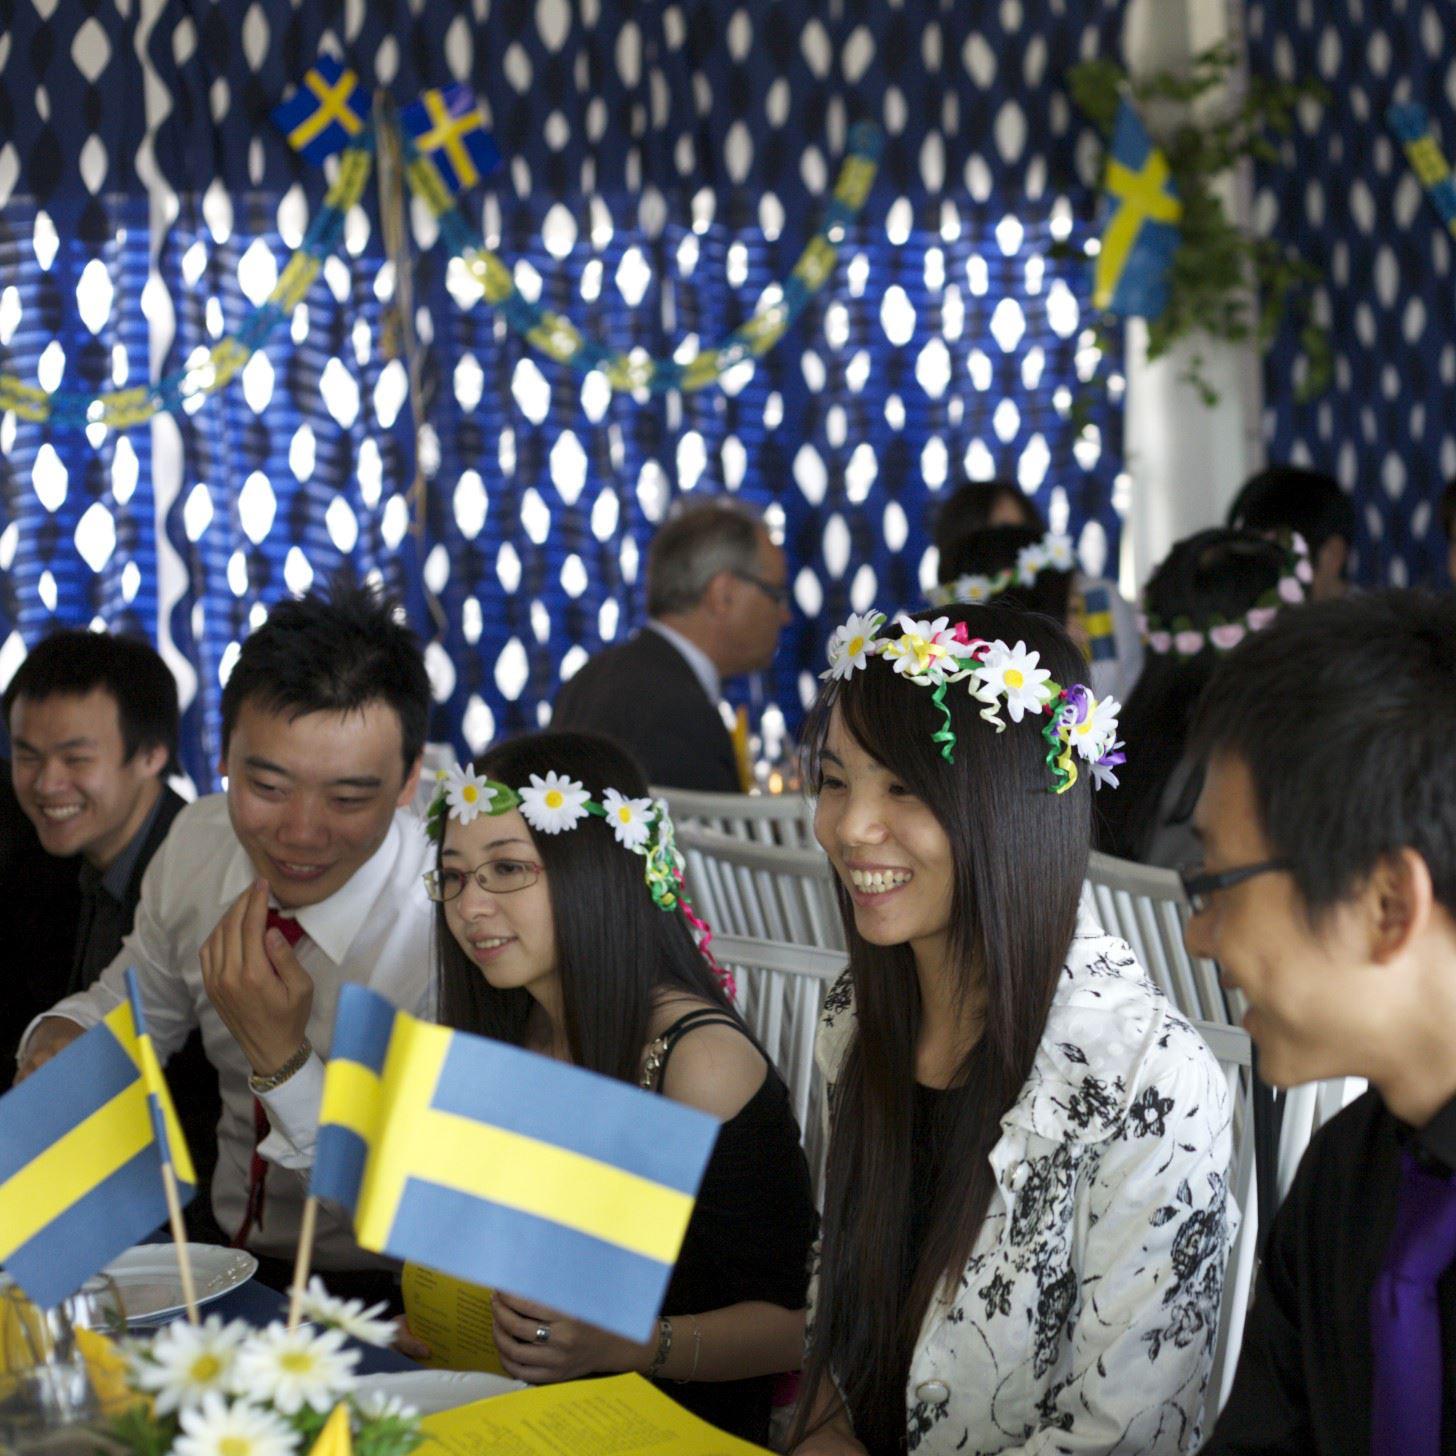 Swedish Festivals